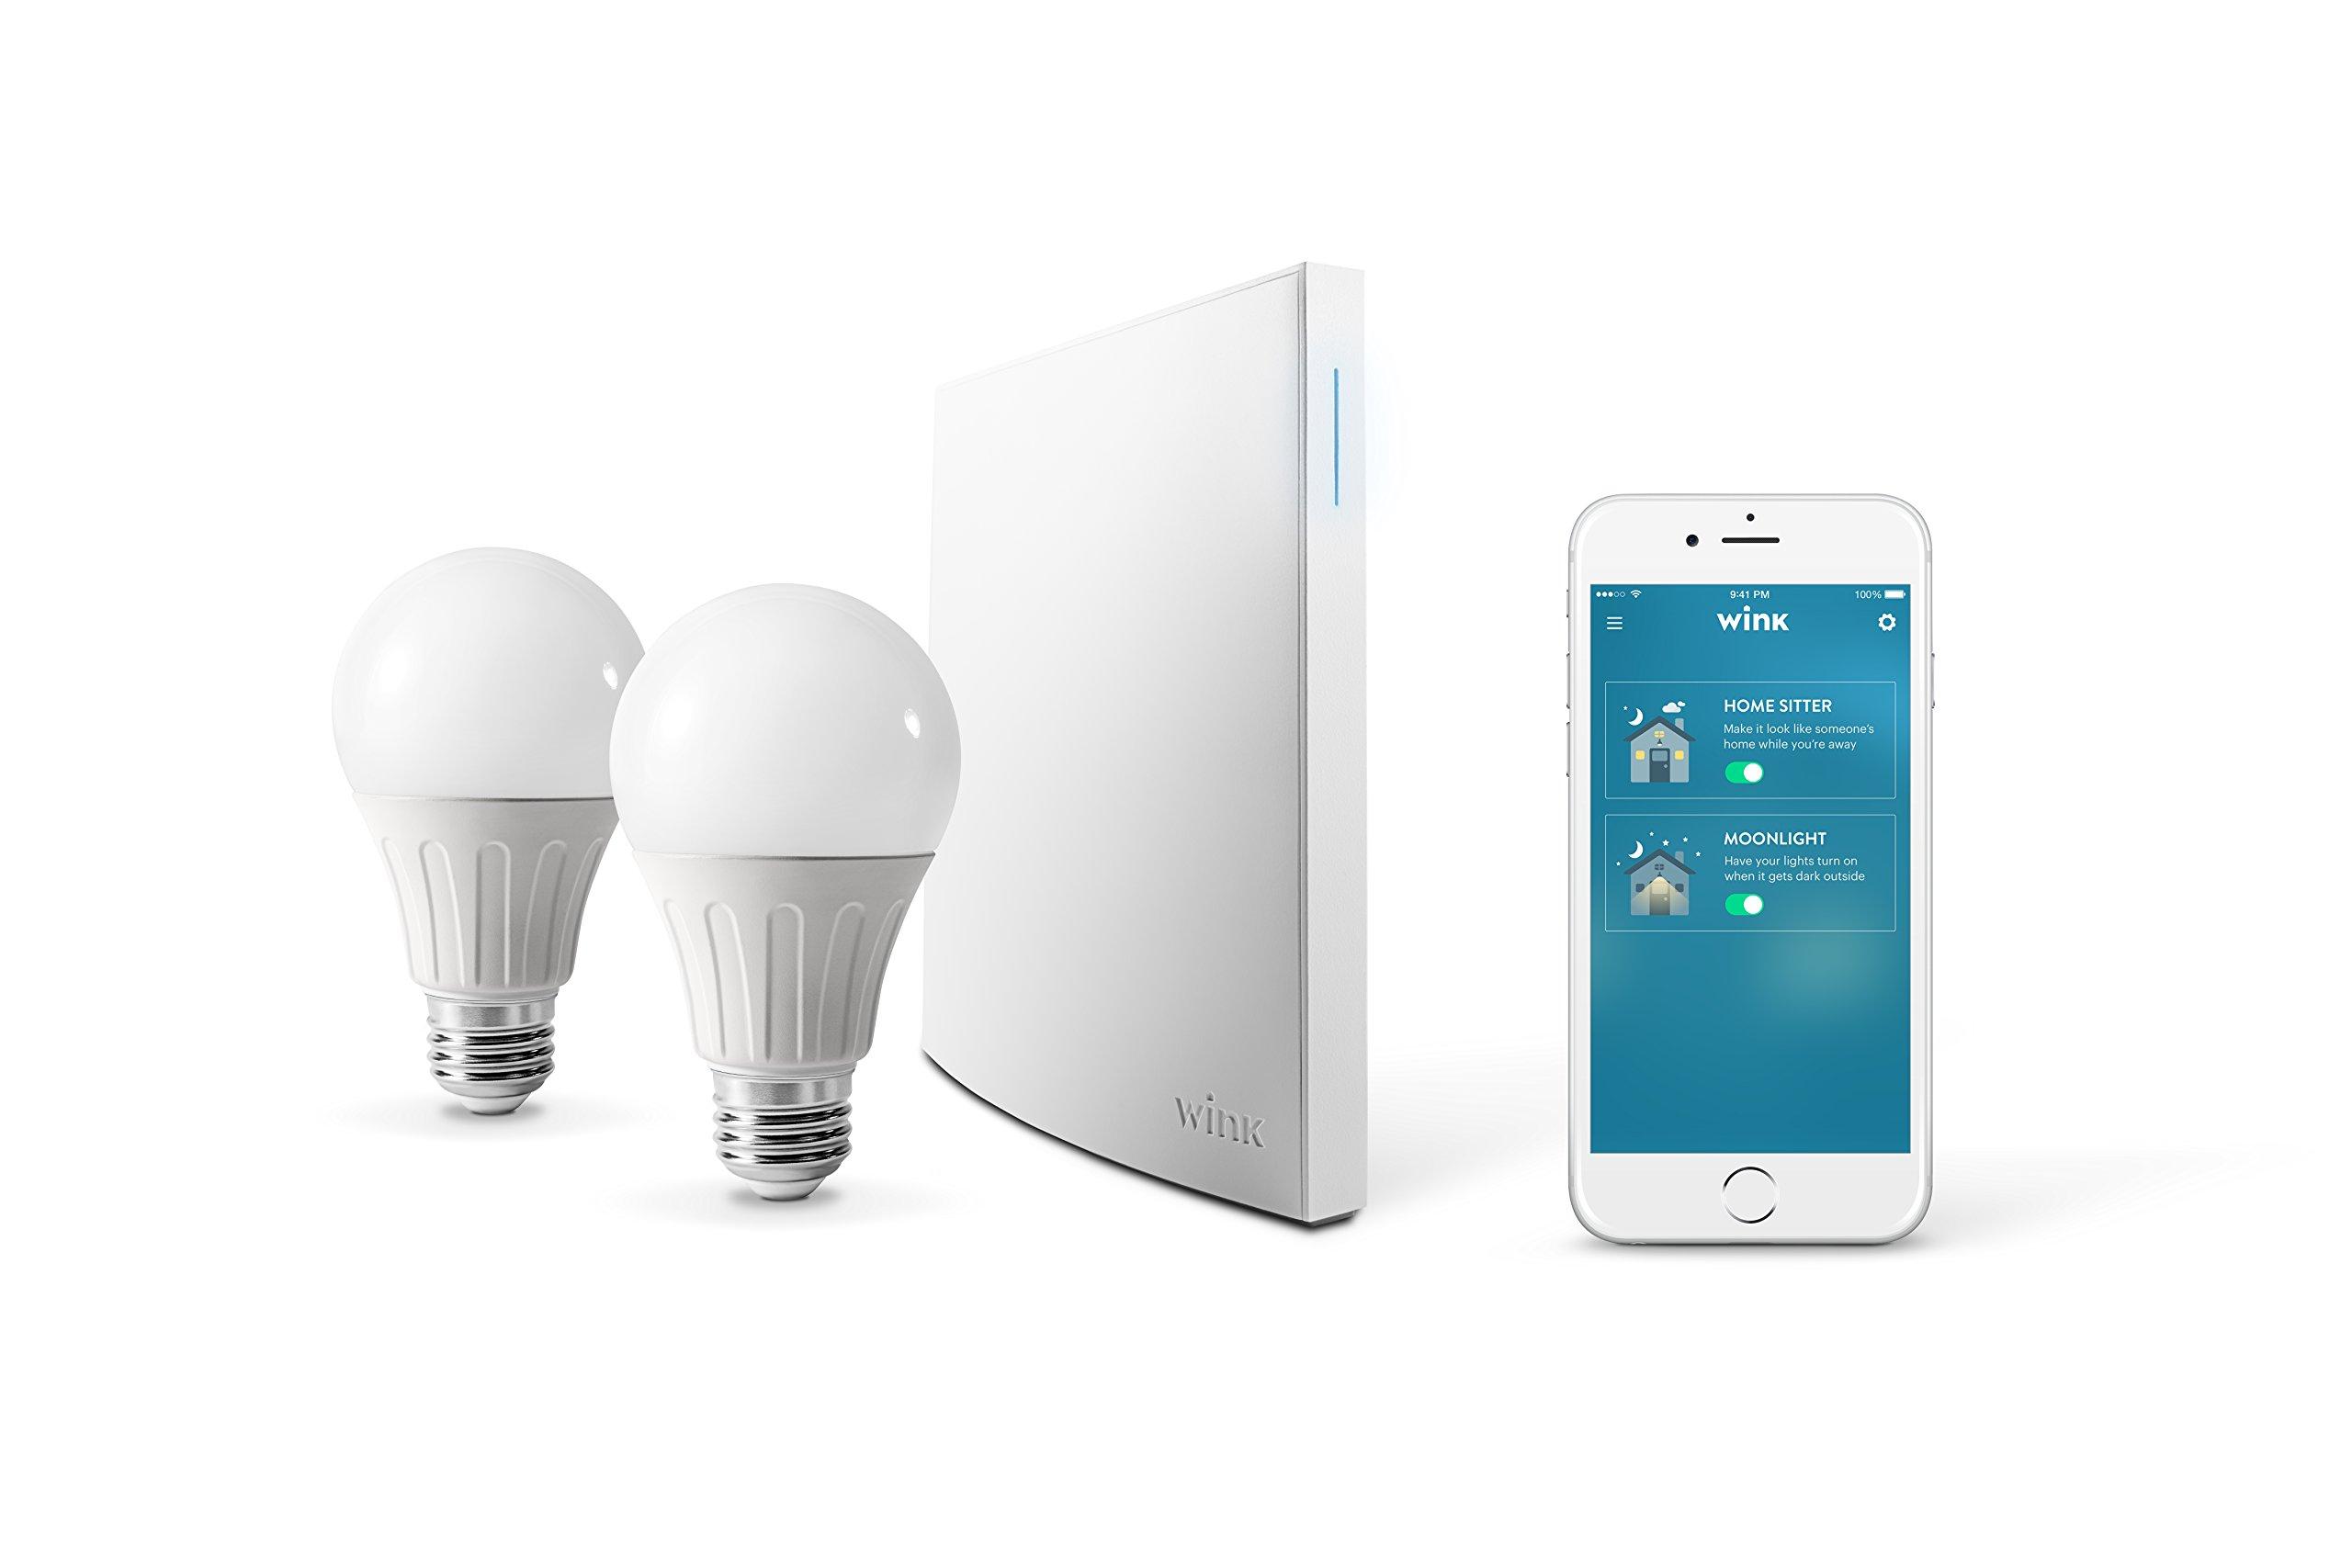 Wink Bright smart lighting essentials., Works with Amazon Alexa by Wink